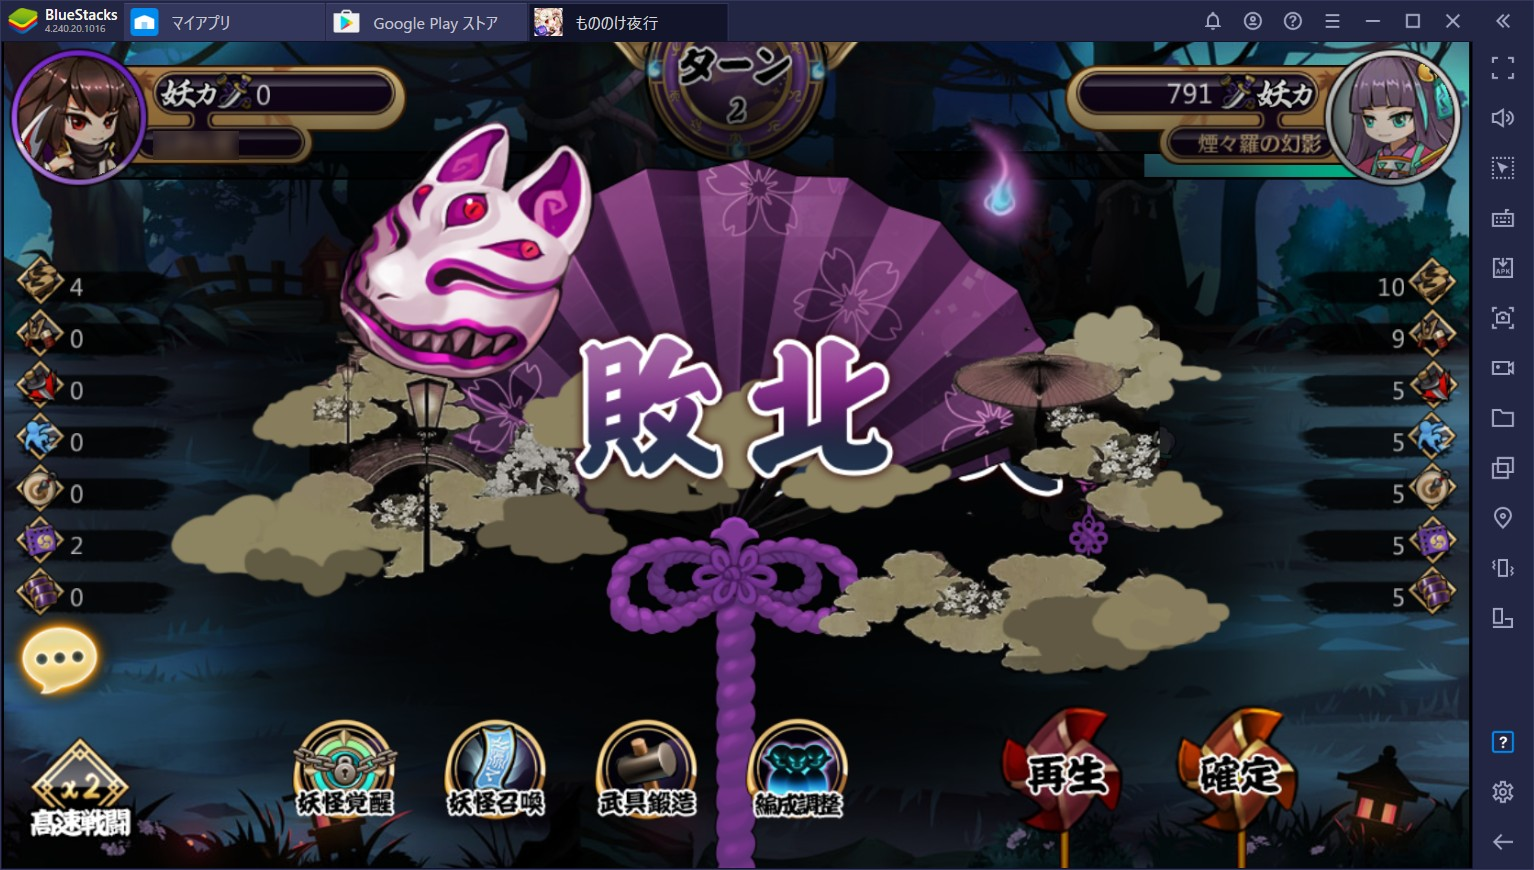 BlueStacks:『もののけ夜行-百鬼異世界物語』の基本的な遊び方とゲームのポイント